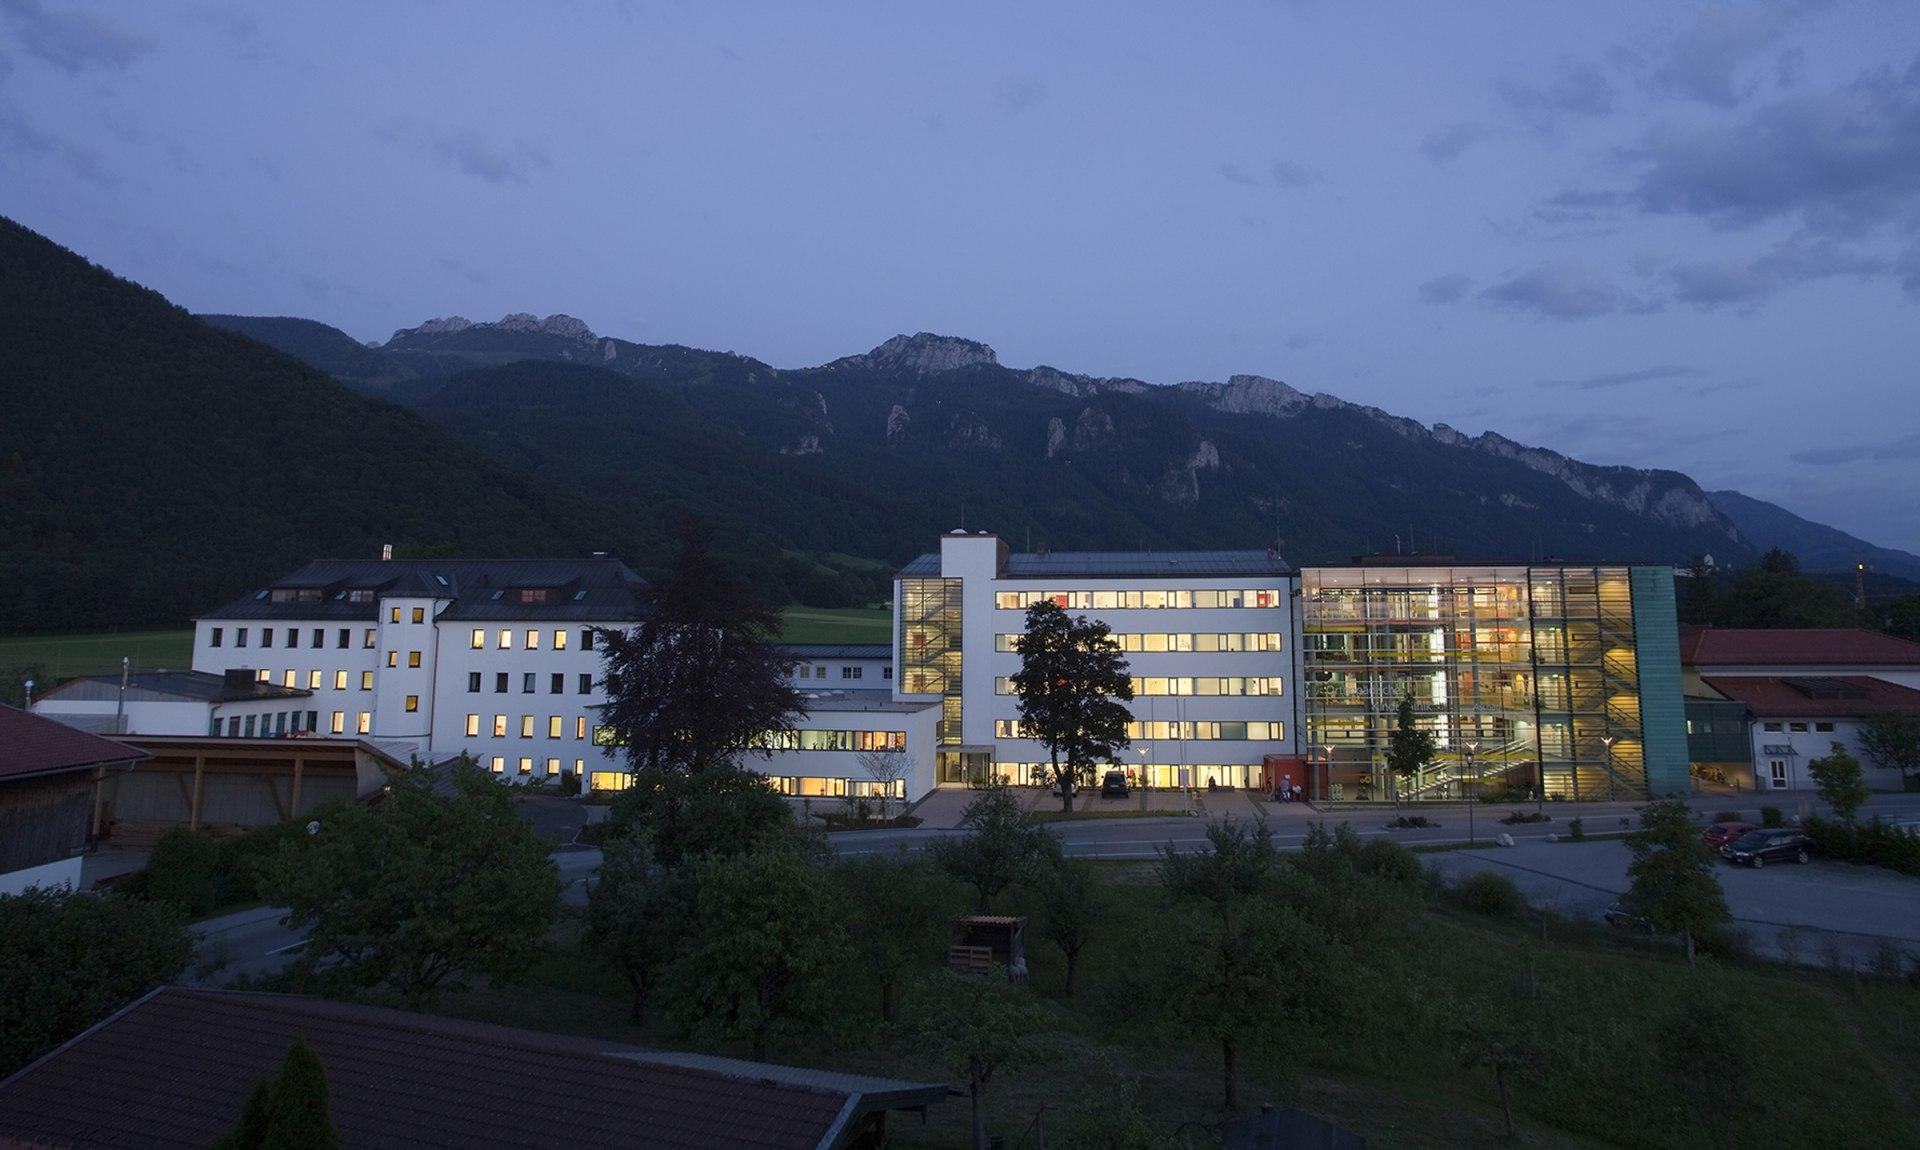 Orthopädische Kinderklinik Aschau i.Ch., © Behandlungszentrum Aschau i.Ch.